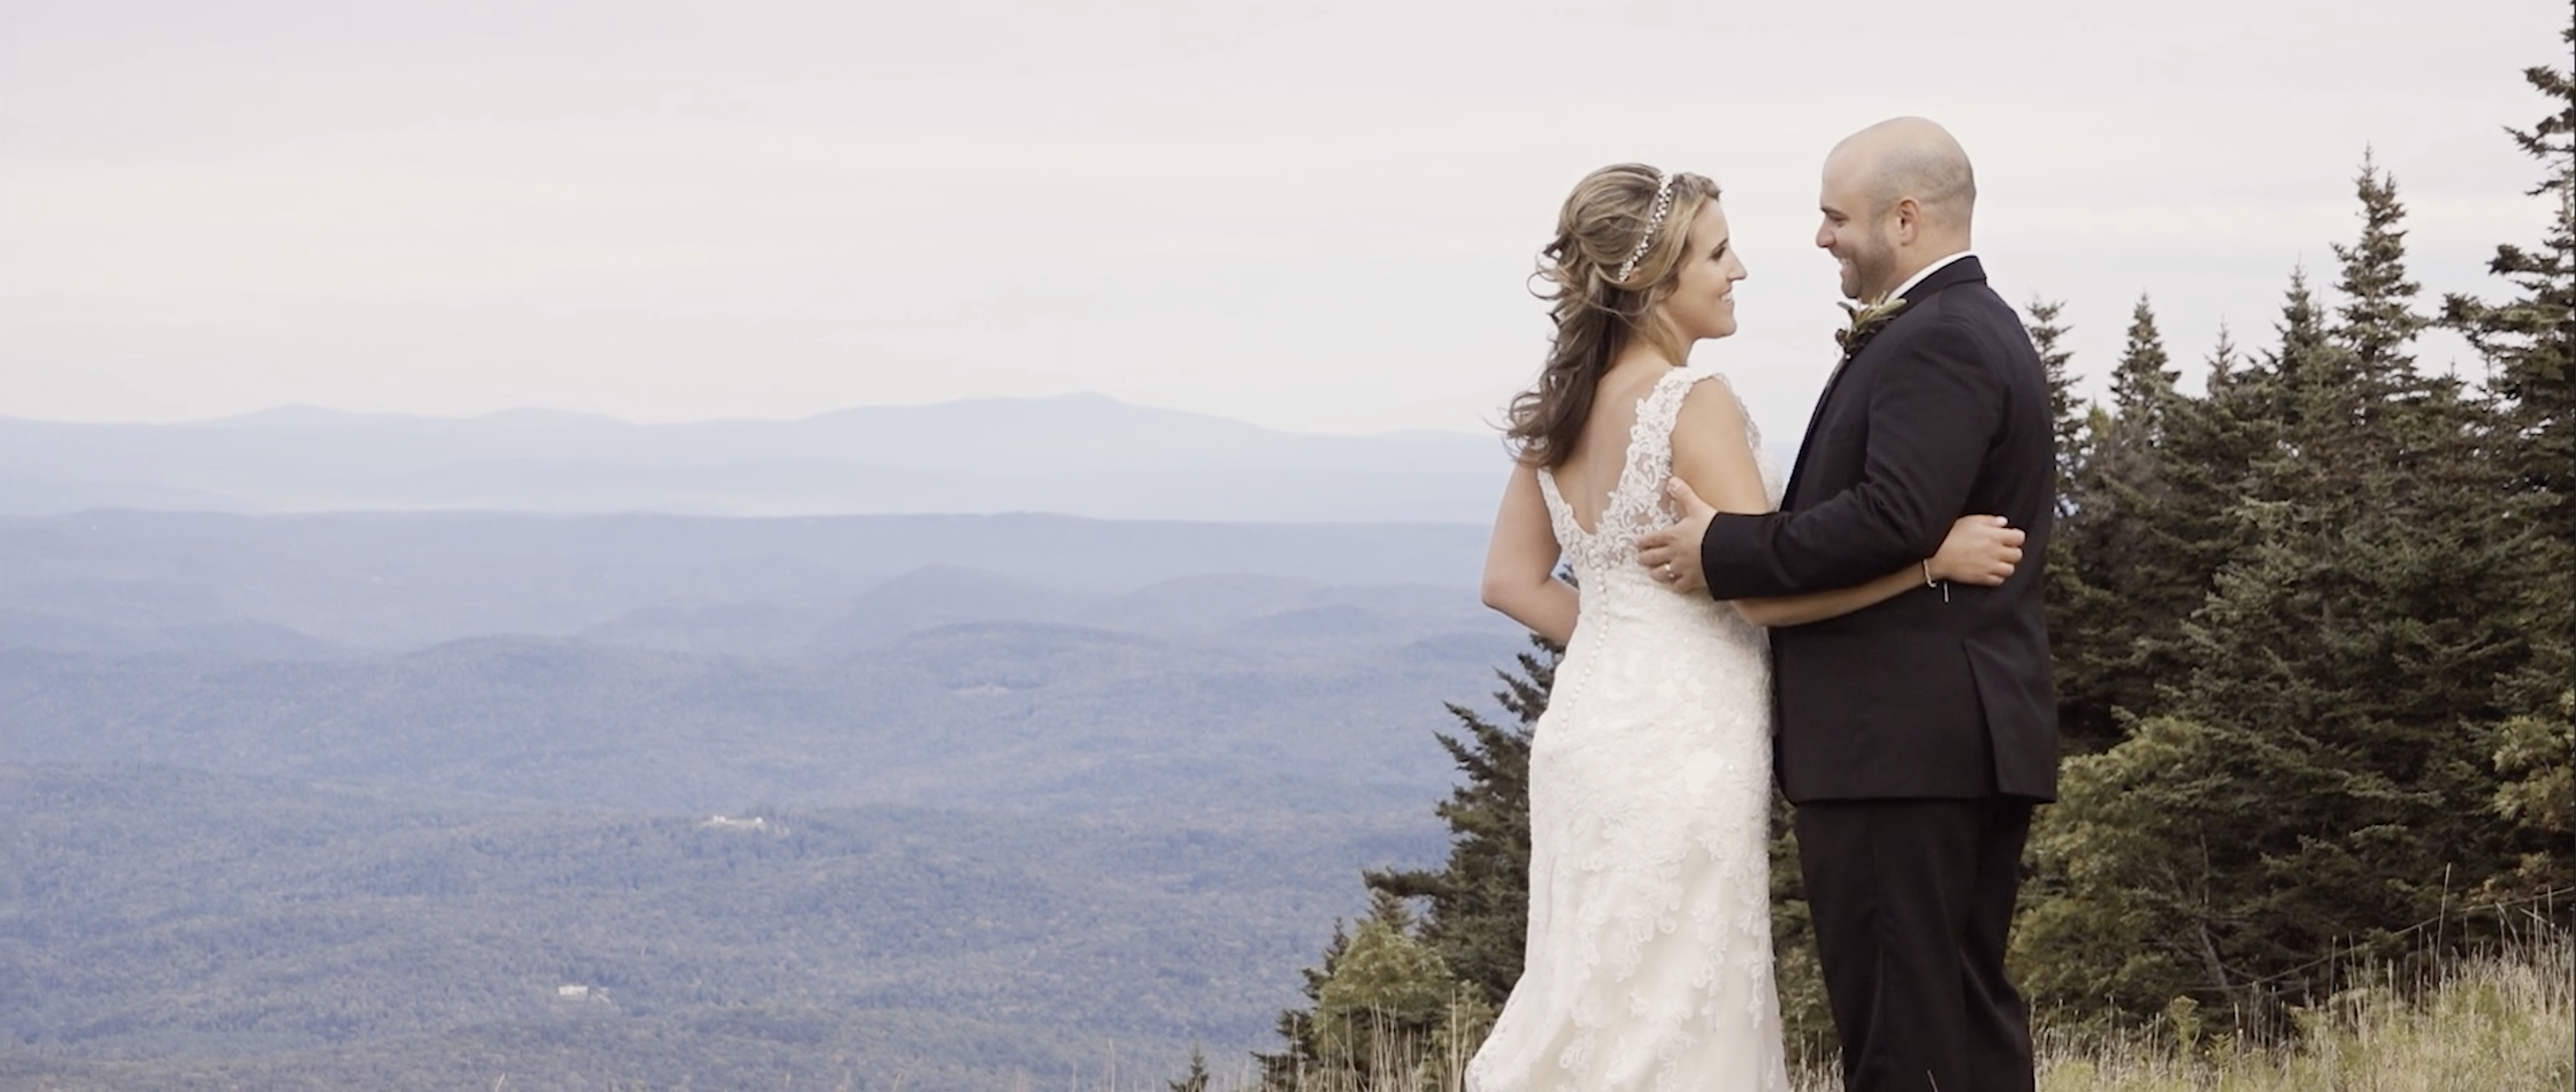 Lisa + Chris | Stratton, Vermont | Stratton Mountain Resort